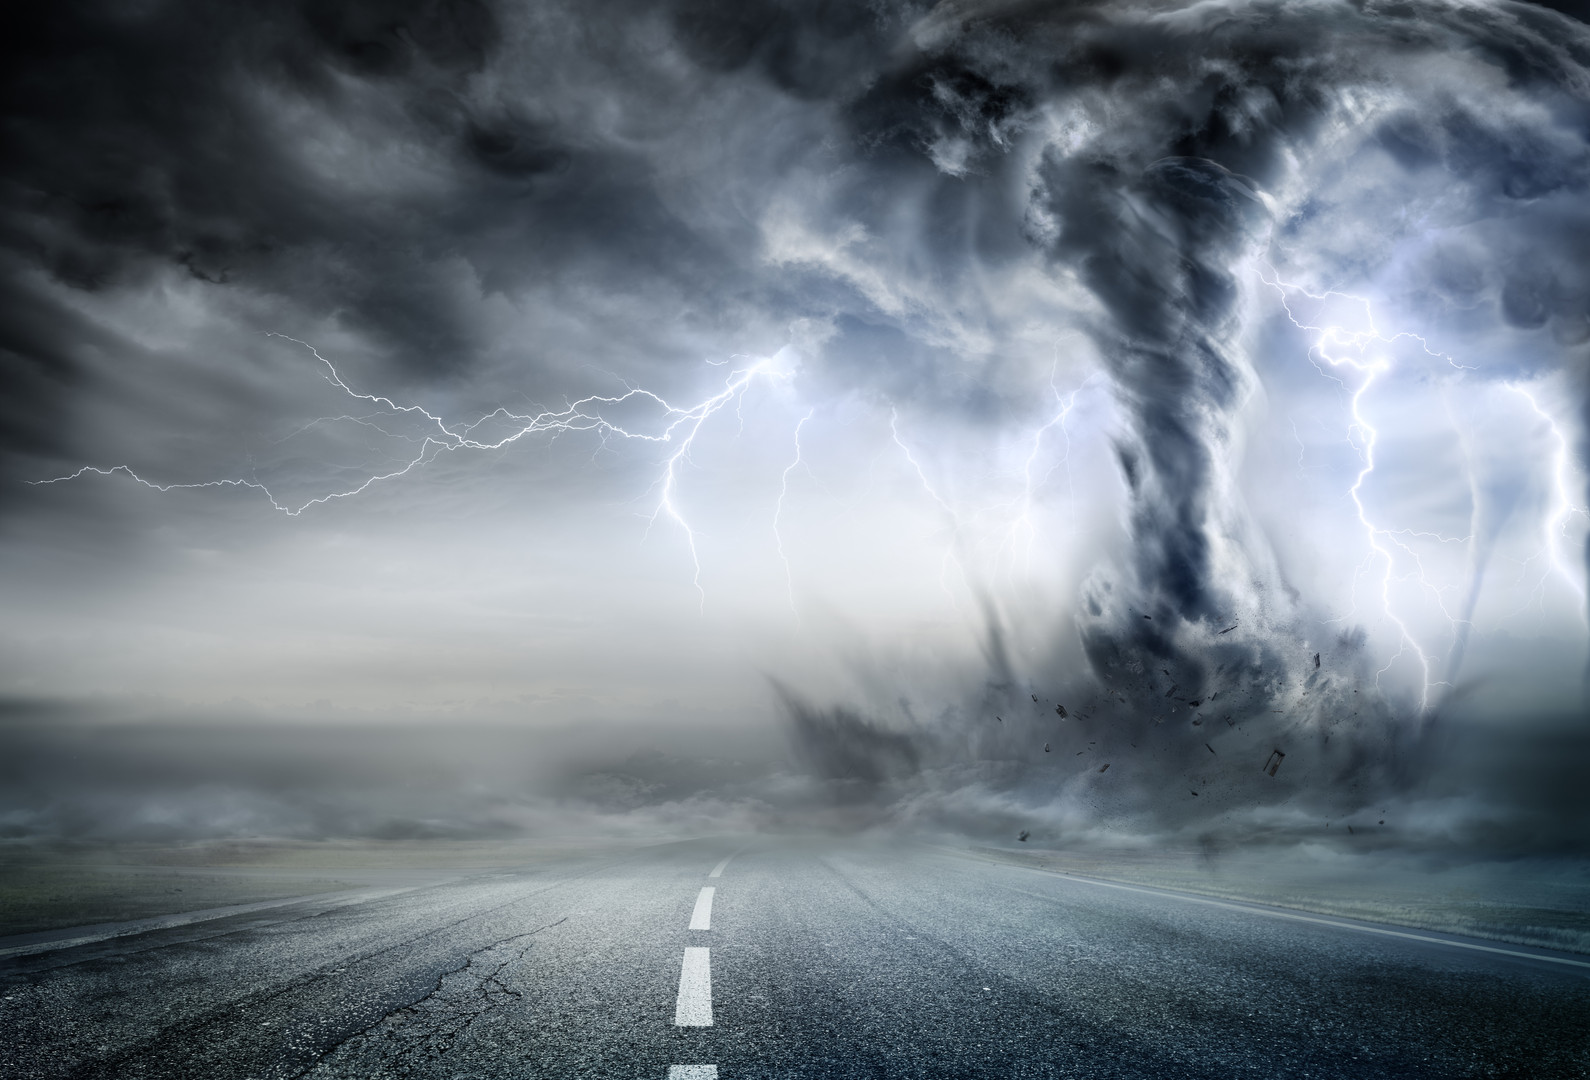 Powerful Tornado On Road In Stormy Lands